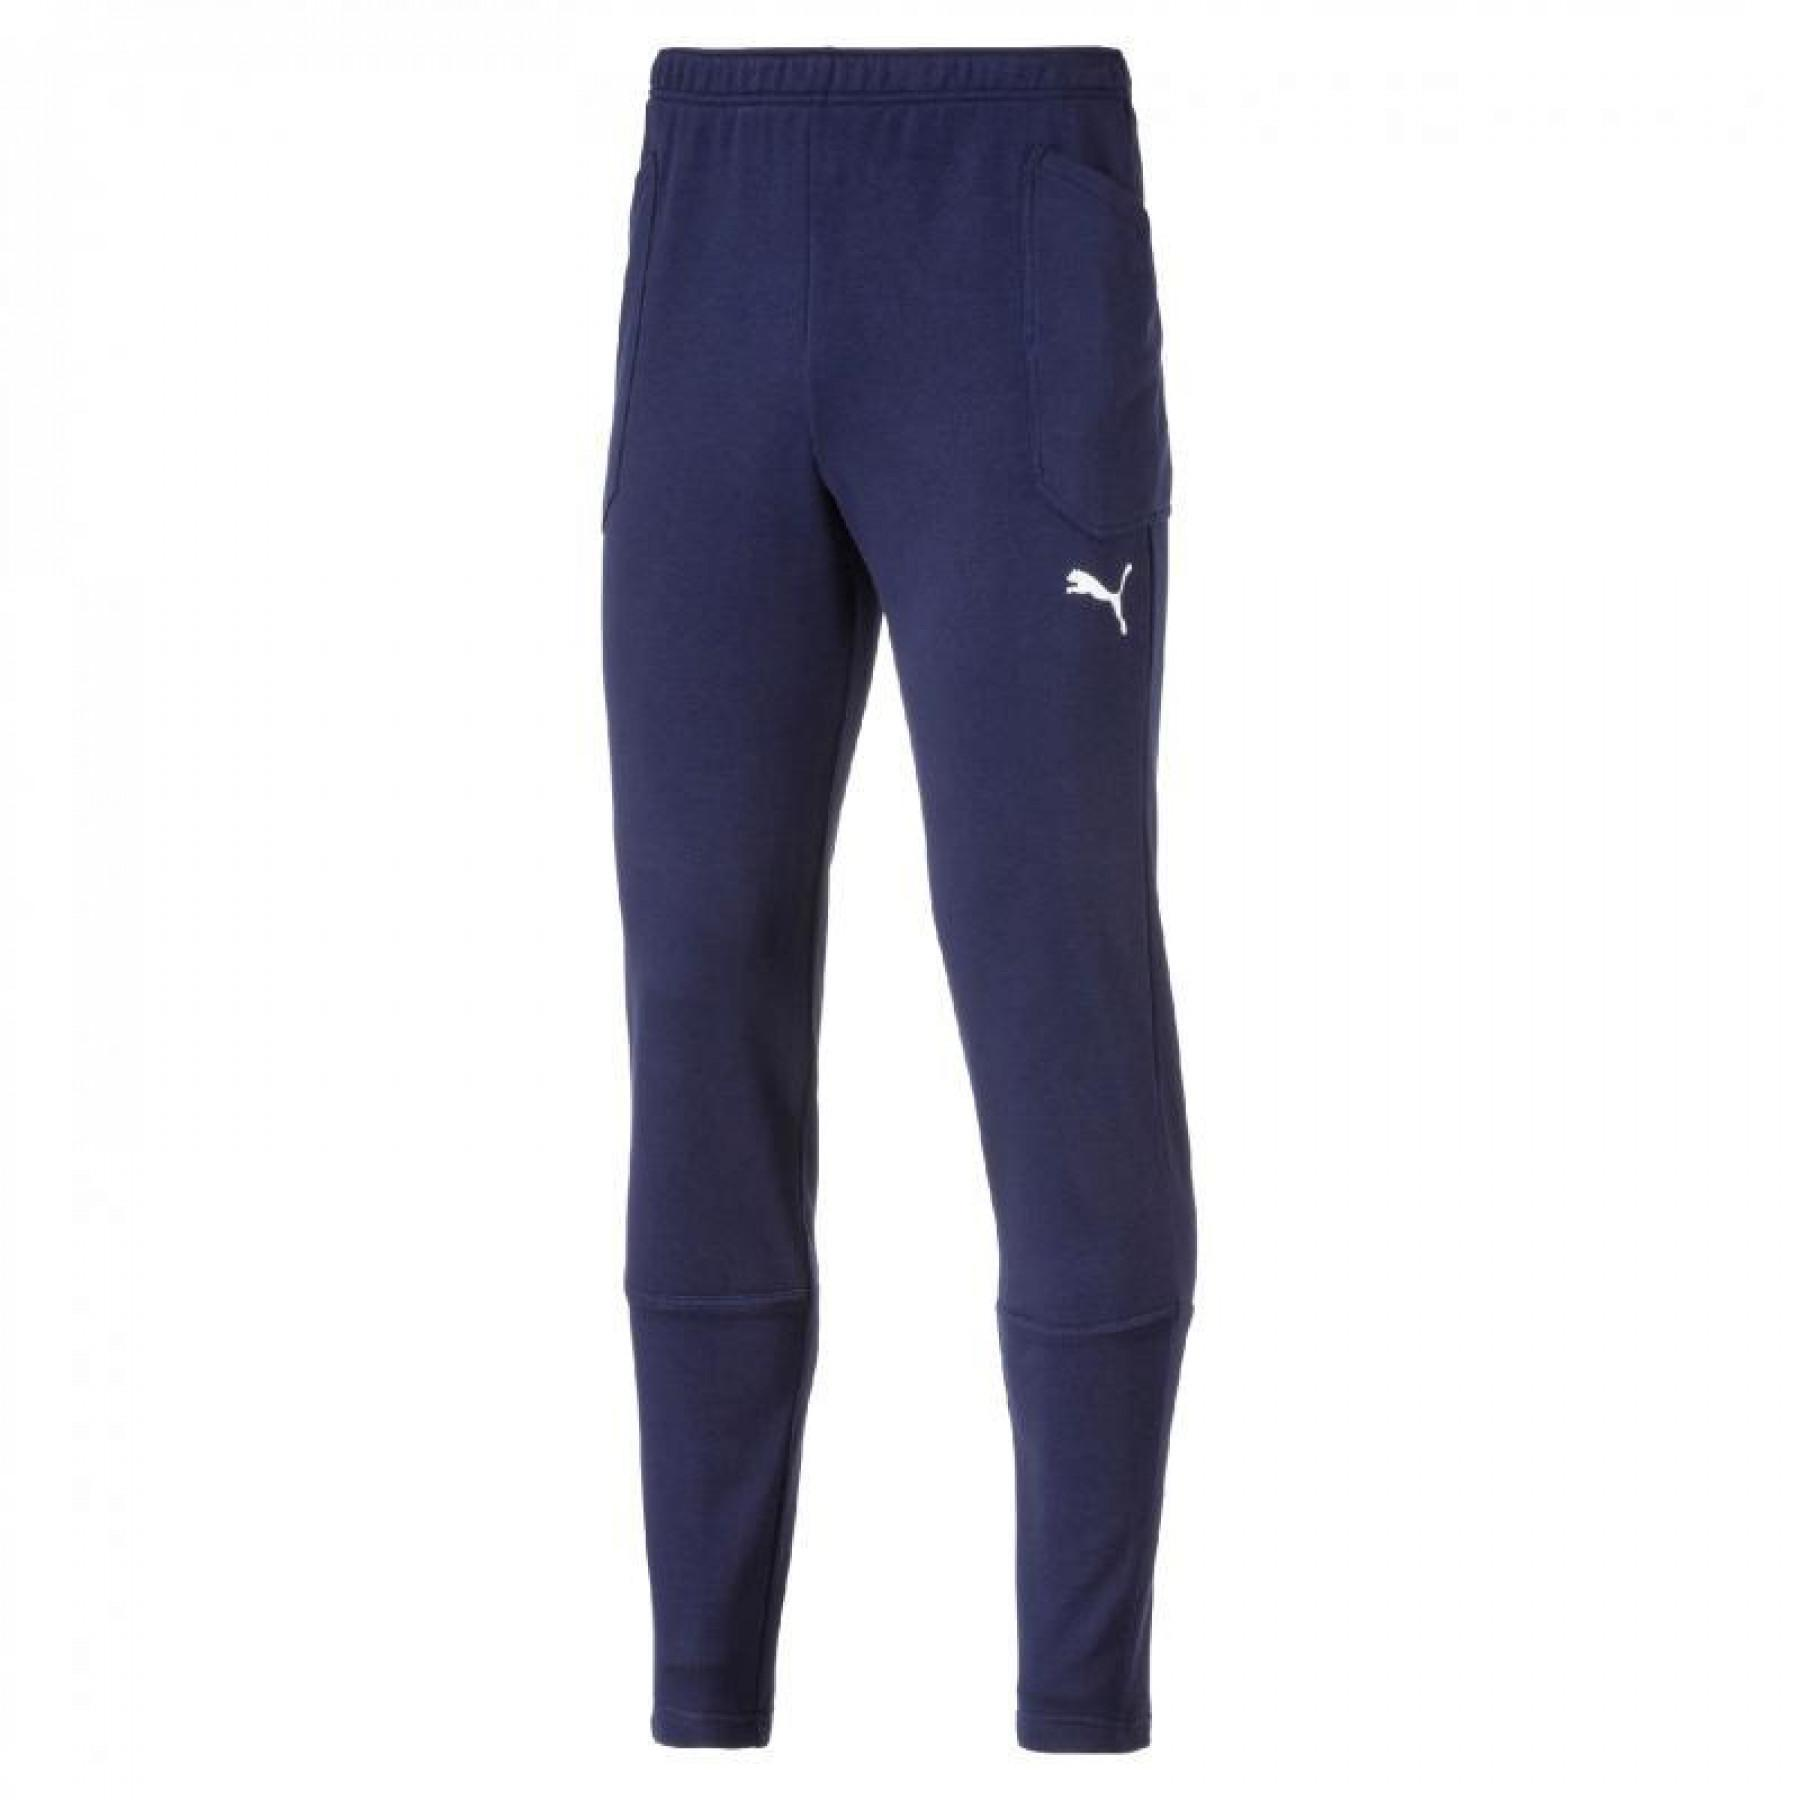 Pants Puma Liga casual